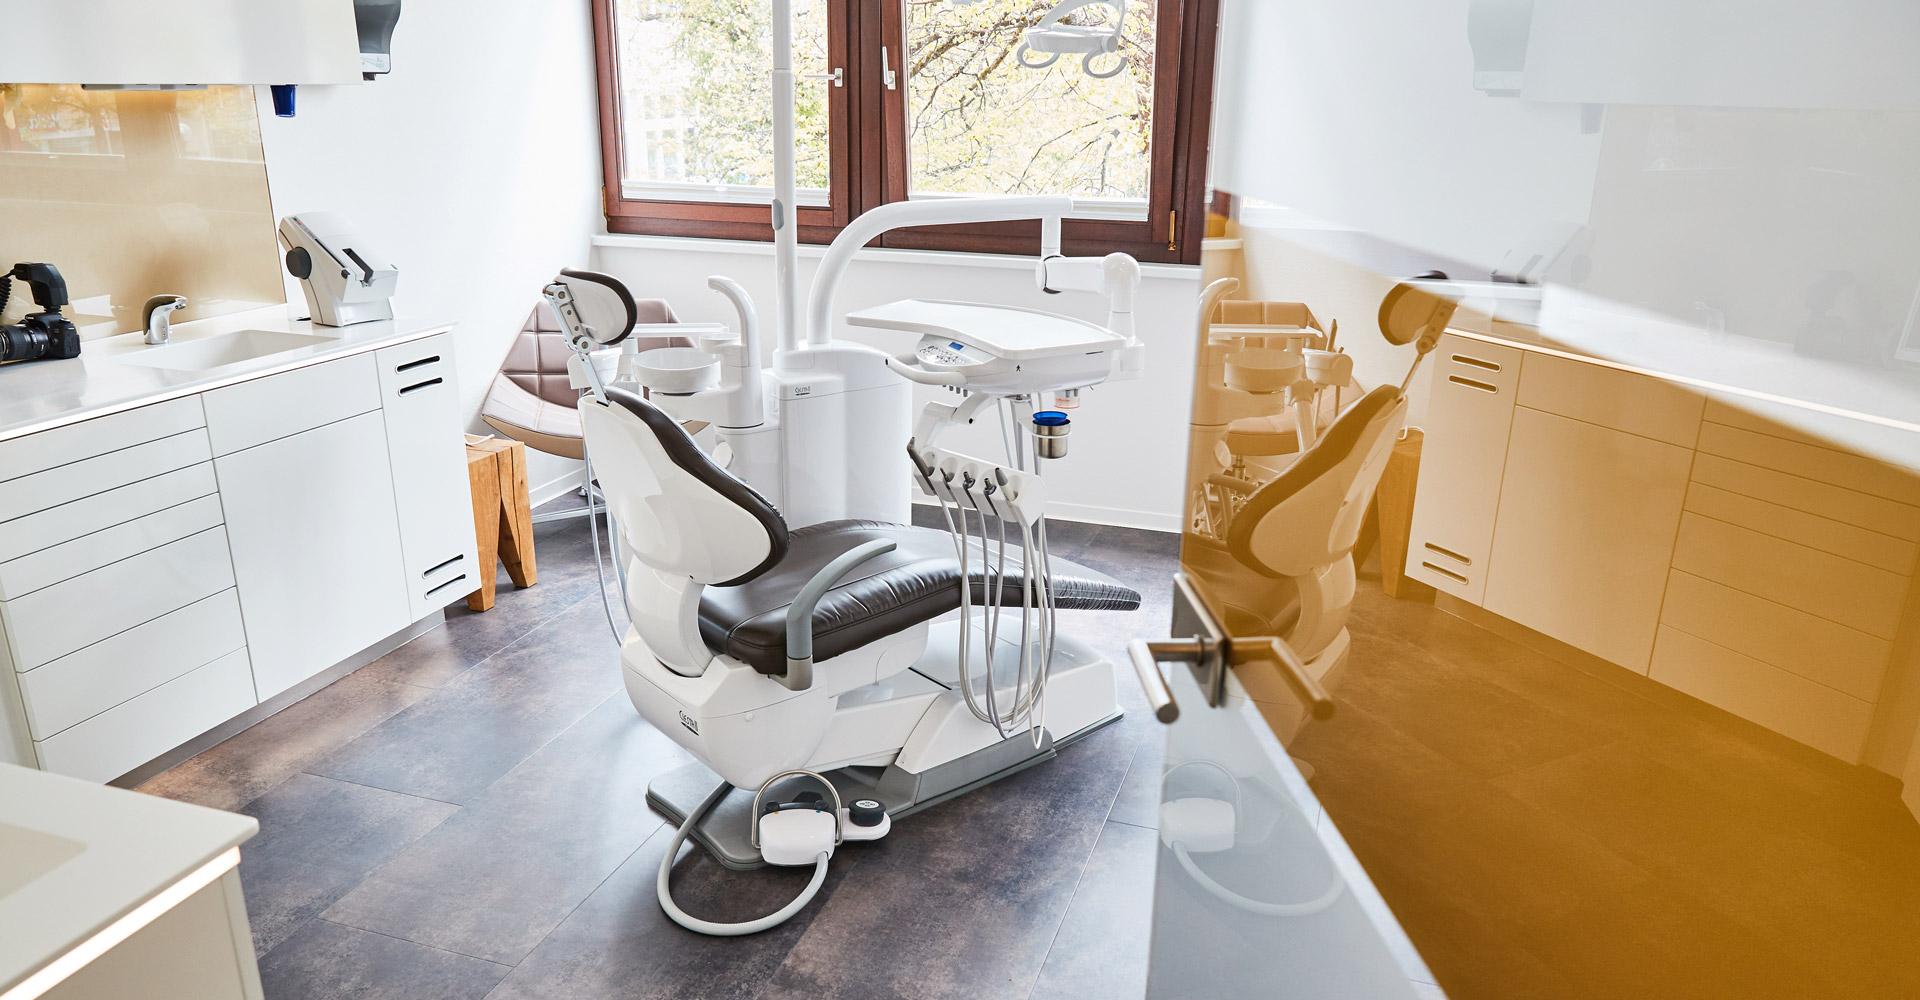 Zahnarztpraxis Dres. Braunschweiger & Gebauer - Laserbehandlung 1